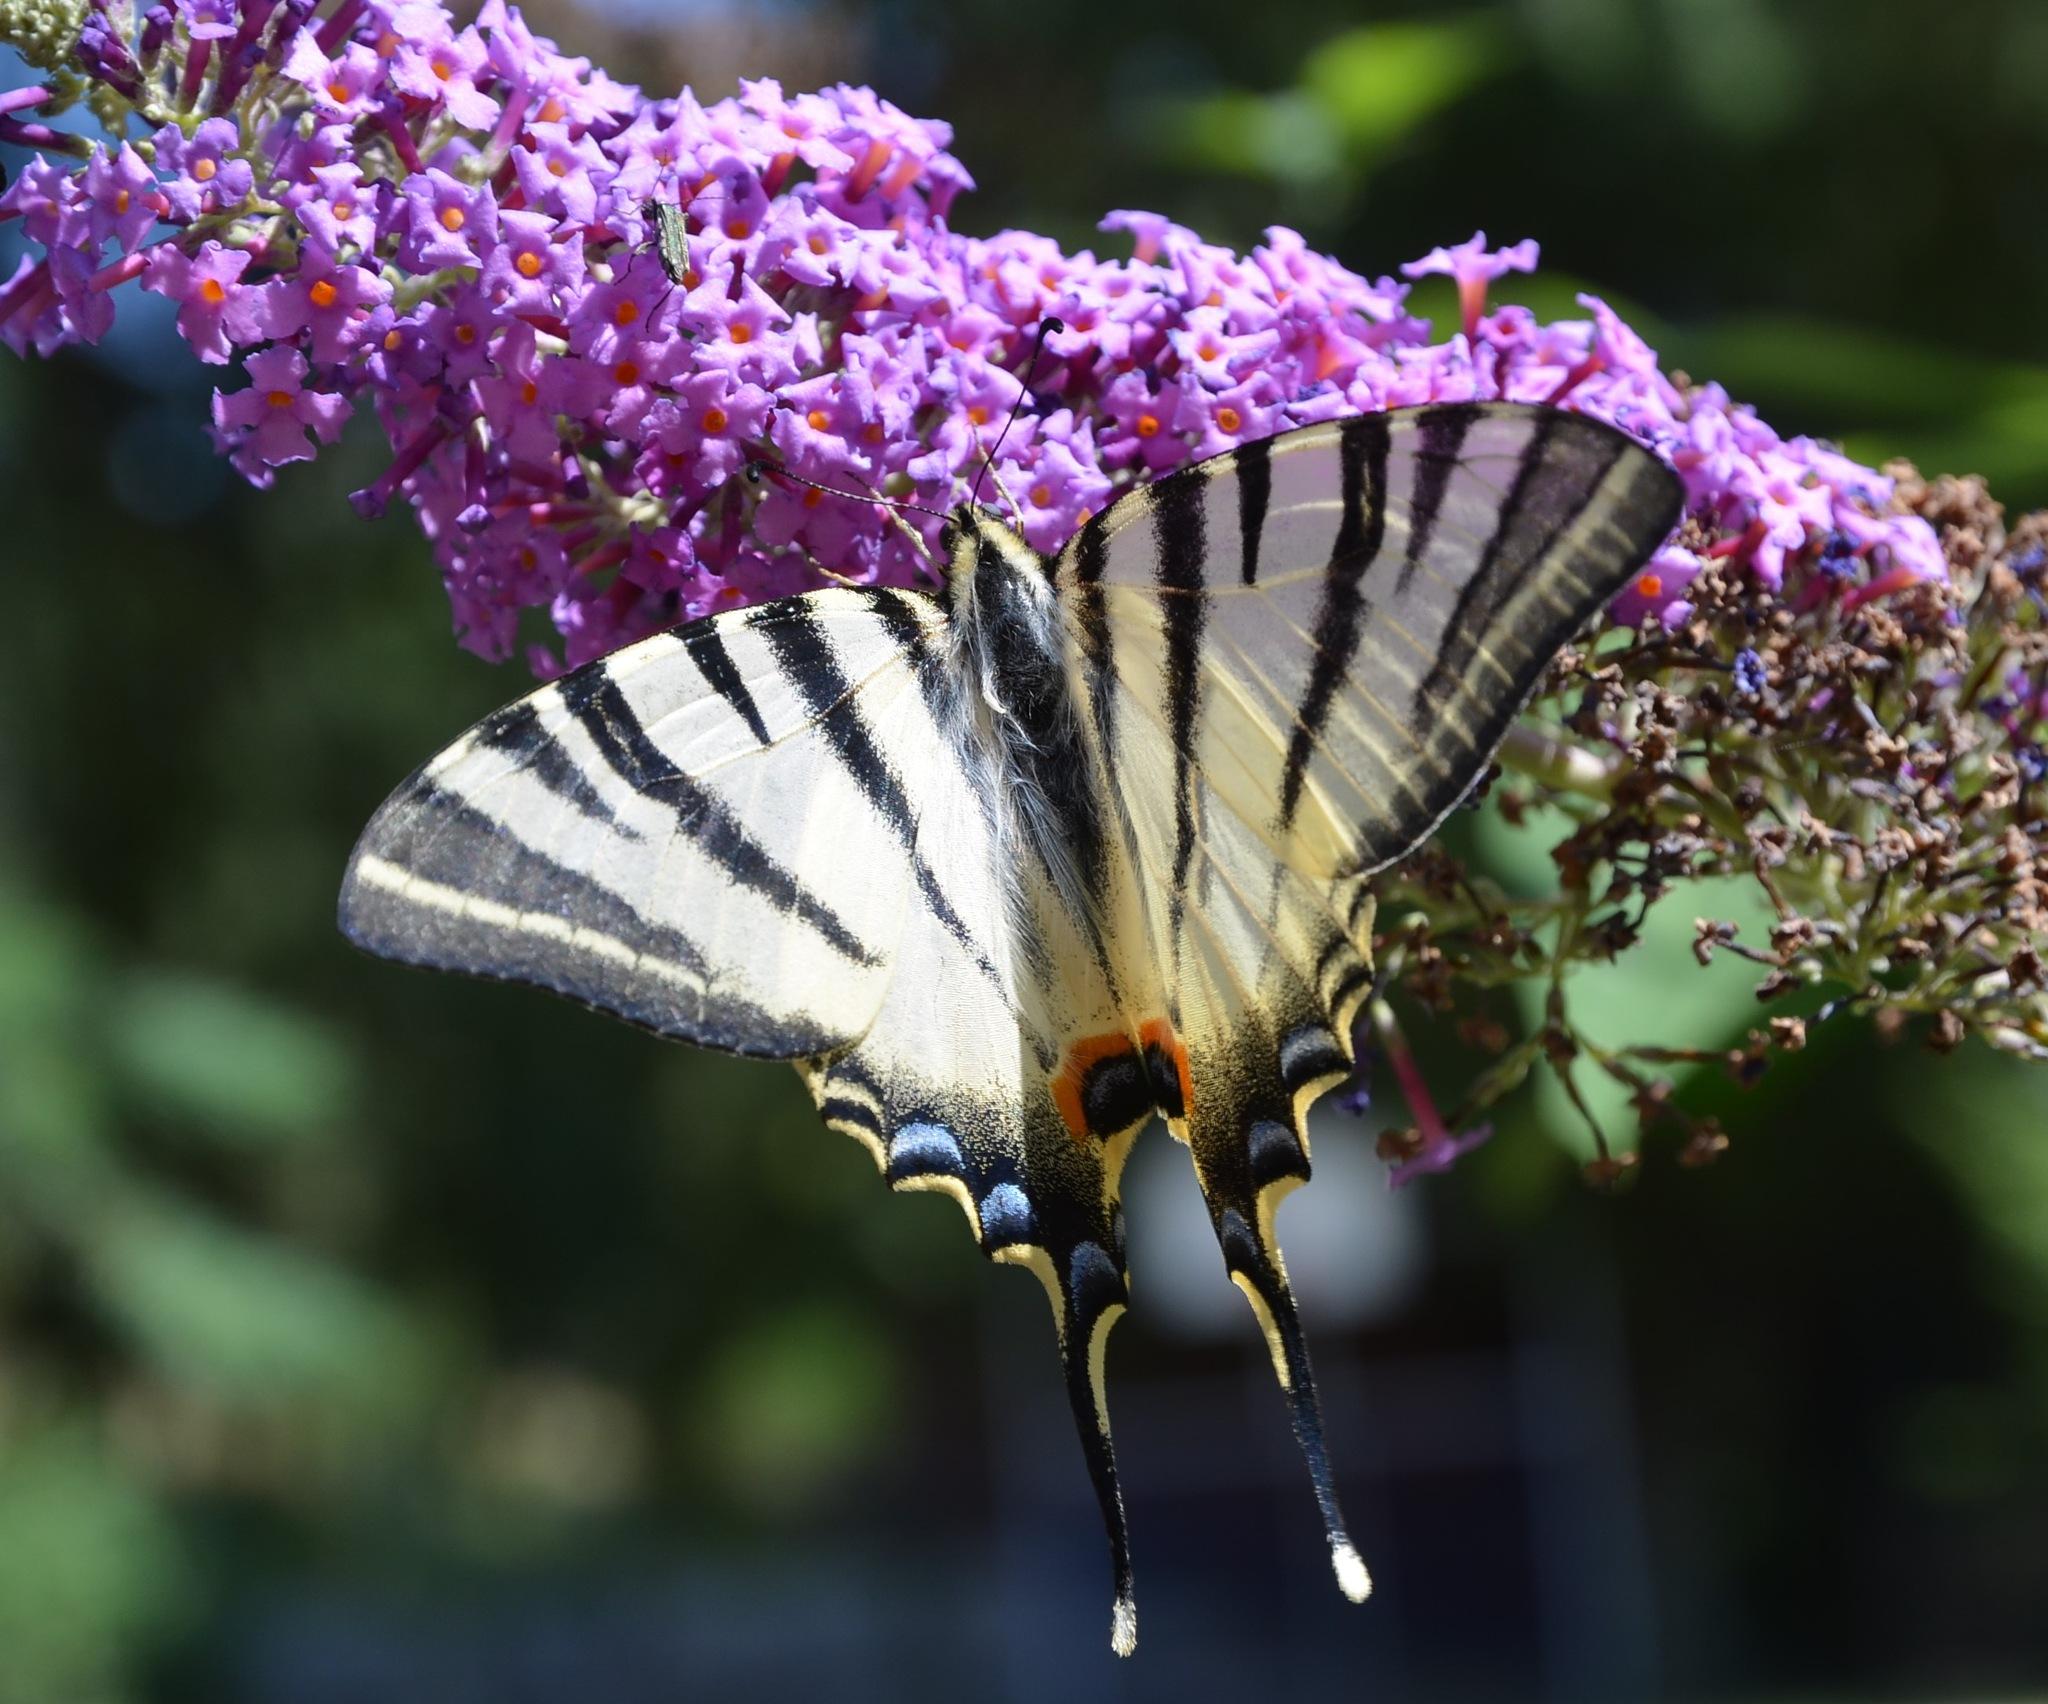 Butterfly by franky.decruw